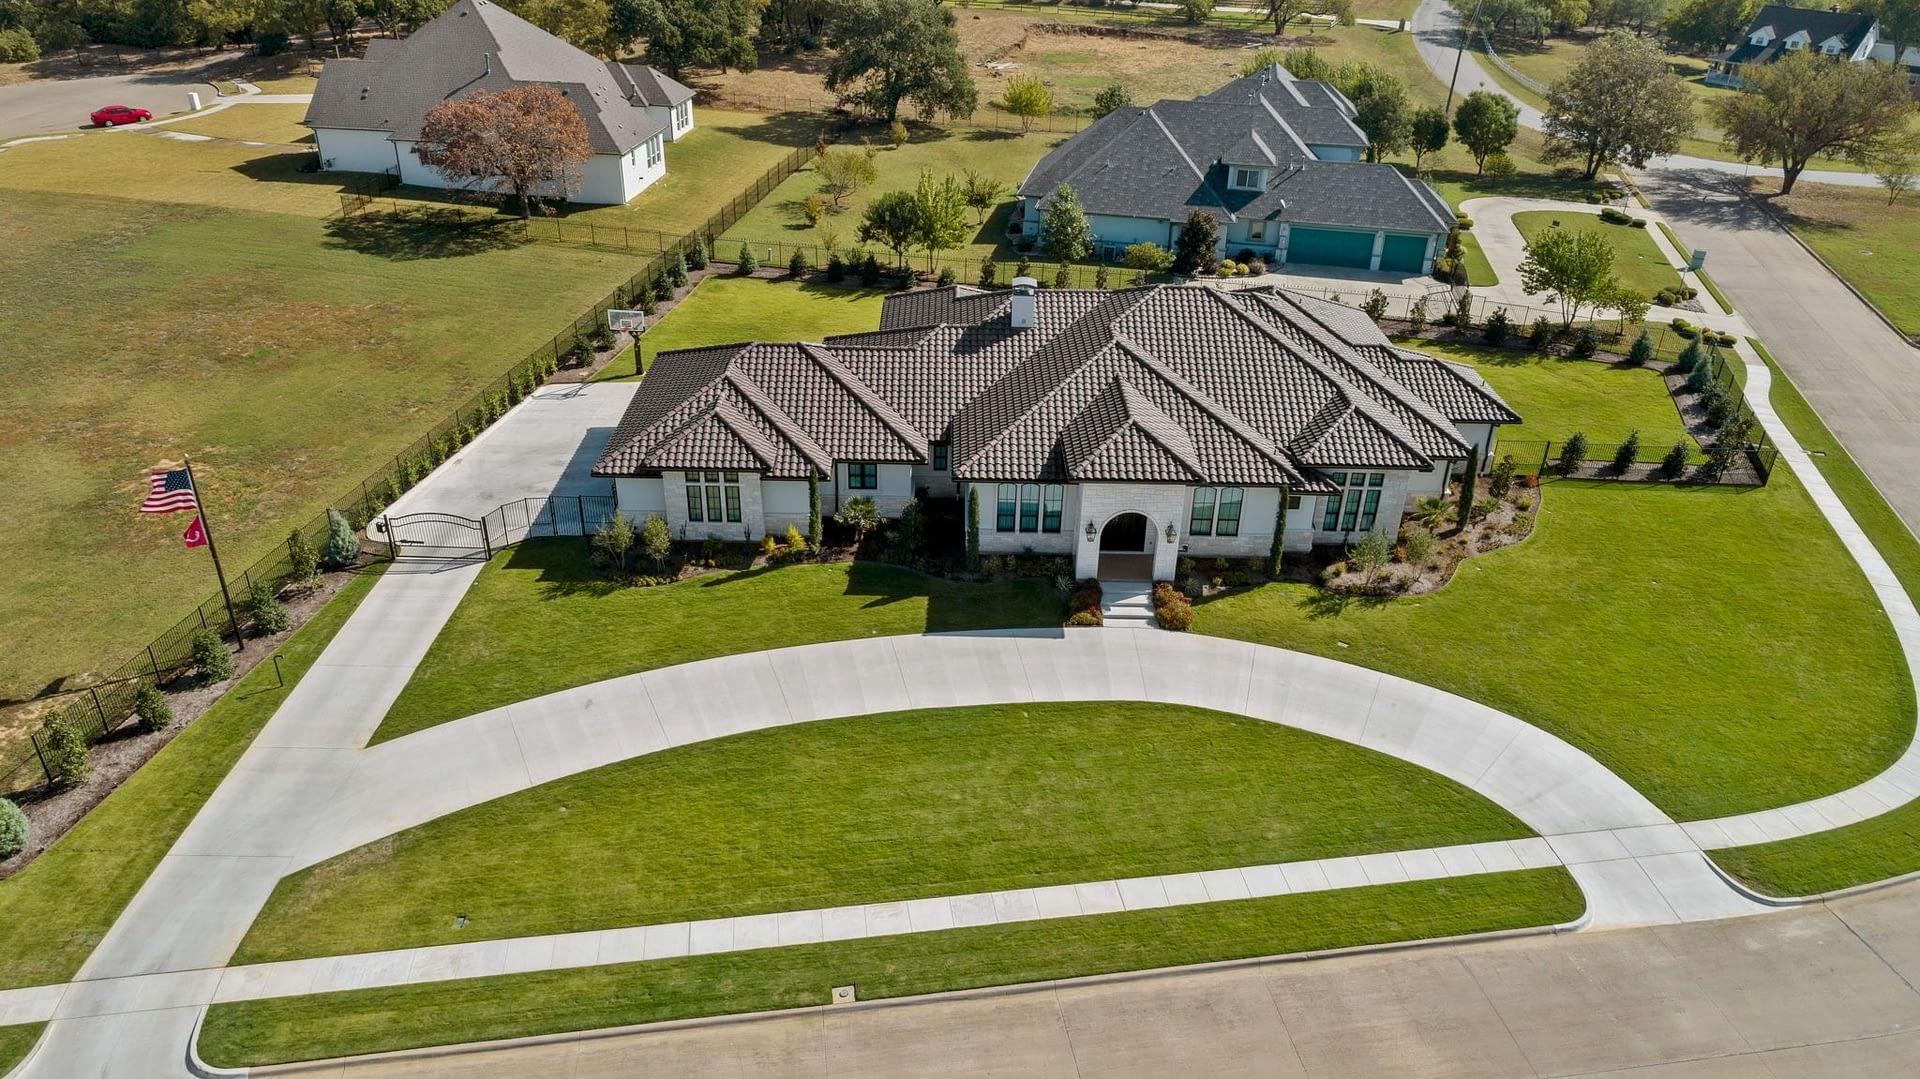 https://ml8umxs3iemf.i.optimole.com/h7Yz7ao-Yh9U3ON2/w:auto/h:auto/q:auto/https://seanknightcustomhomes.com/wp-content/uploads/2020/11/modern-farmhouse-aerial-fort-worth-texas-7.jpg